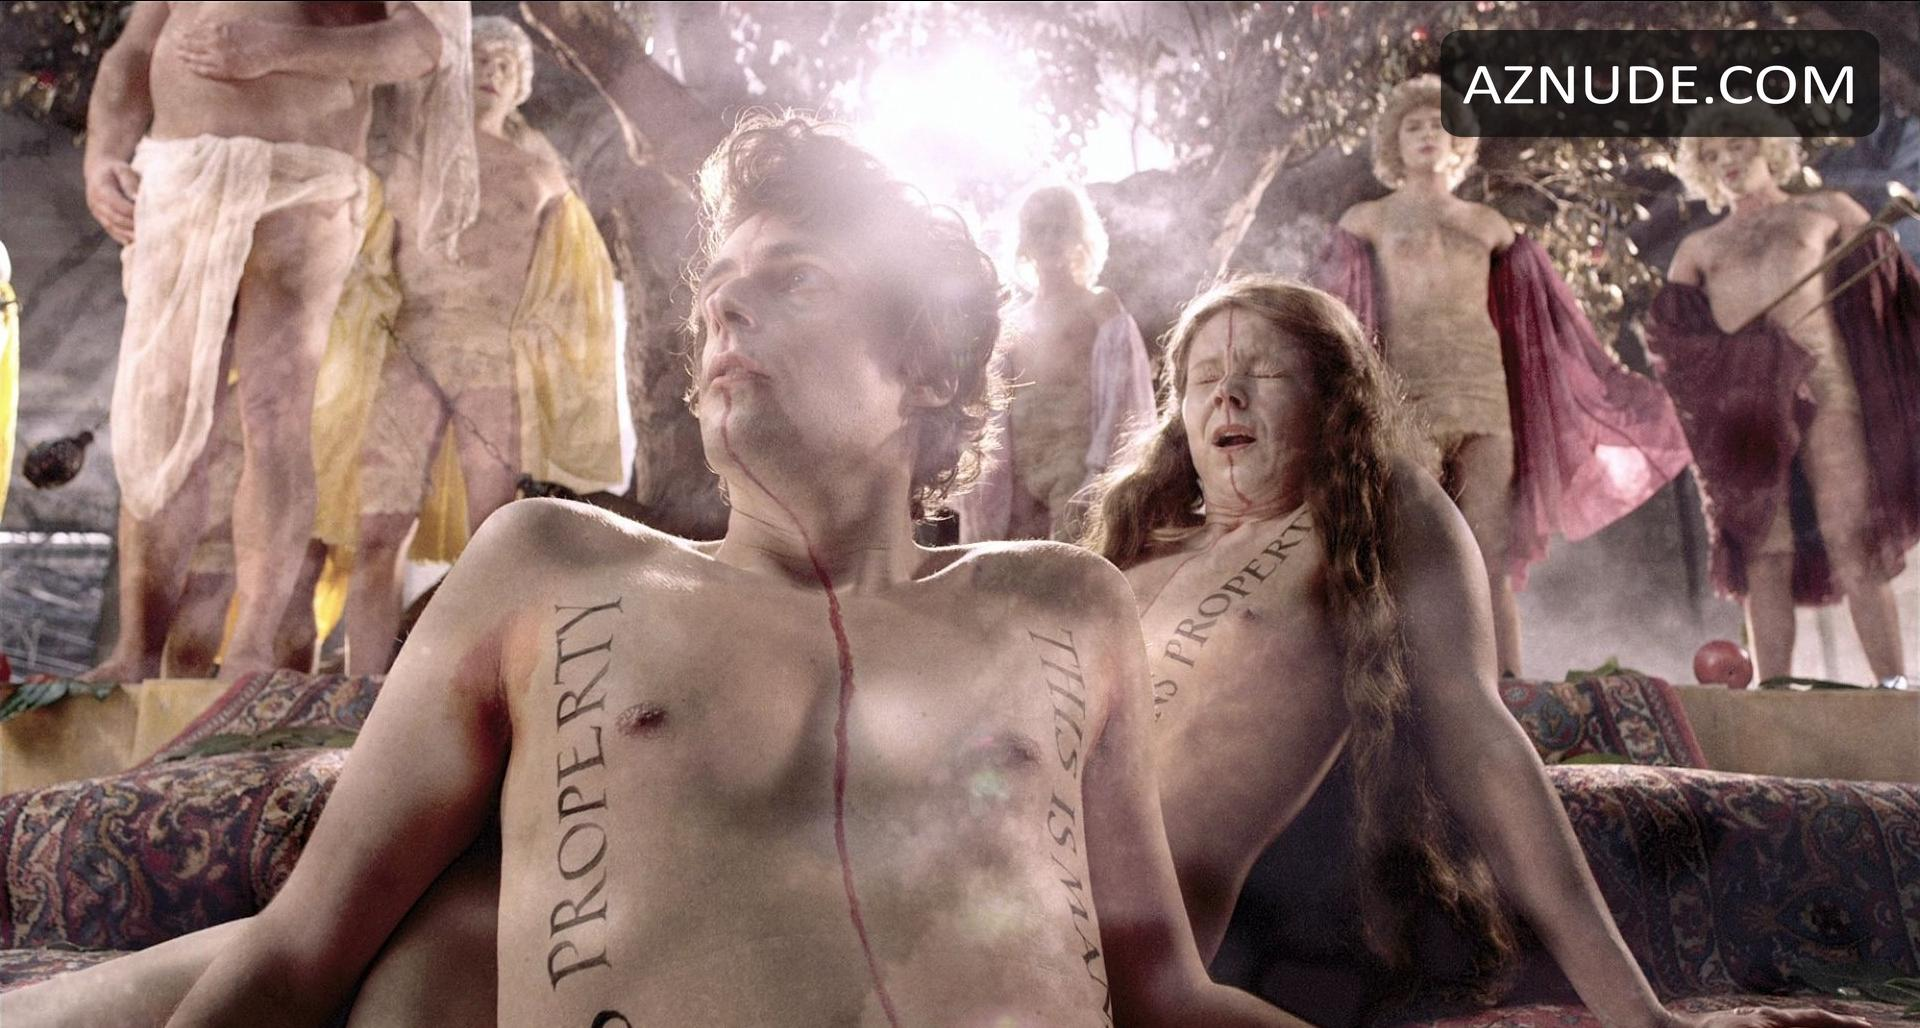 Christy chung nude movie